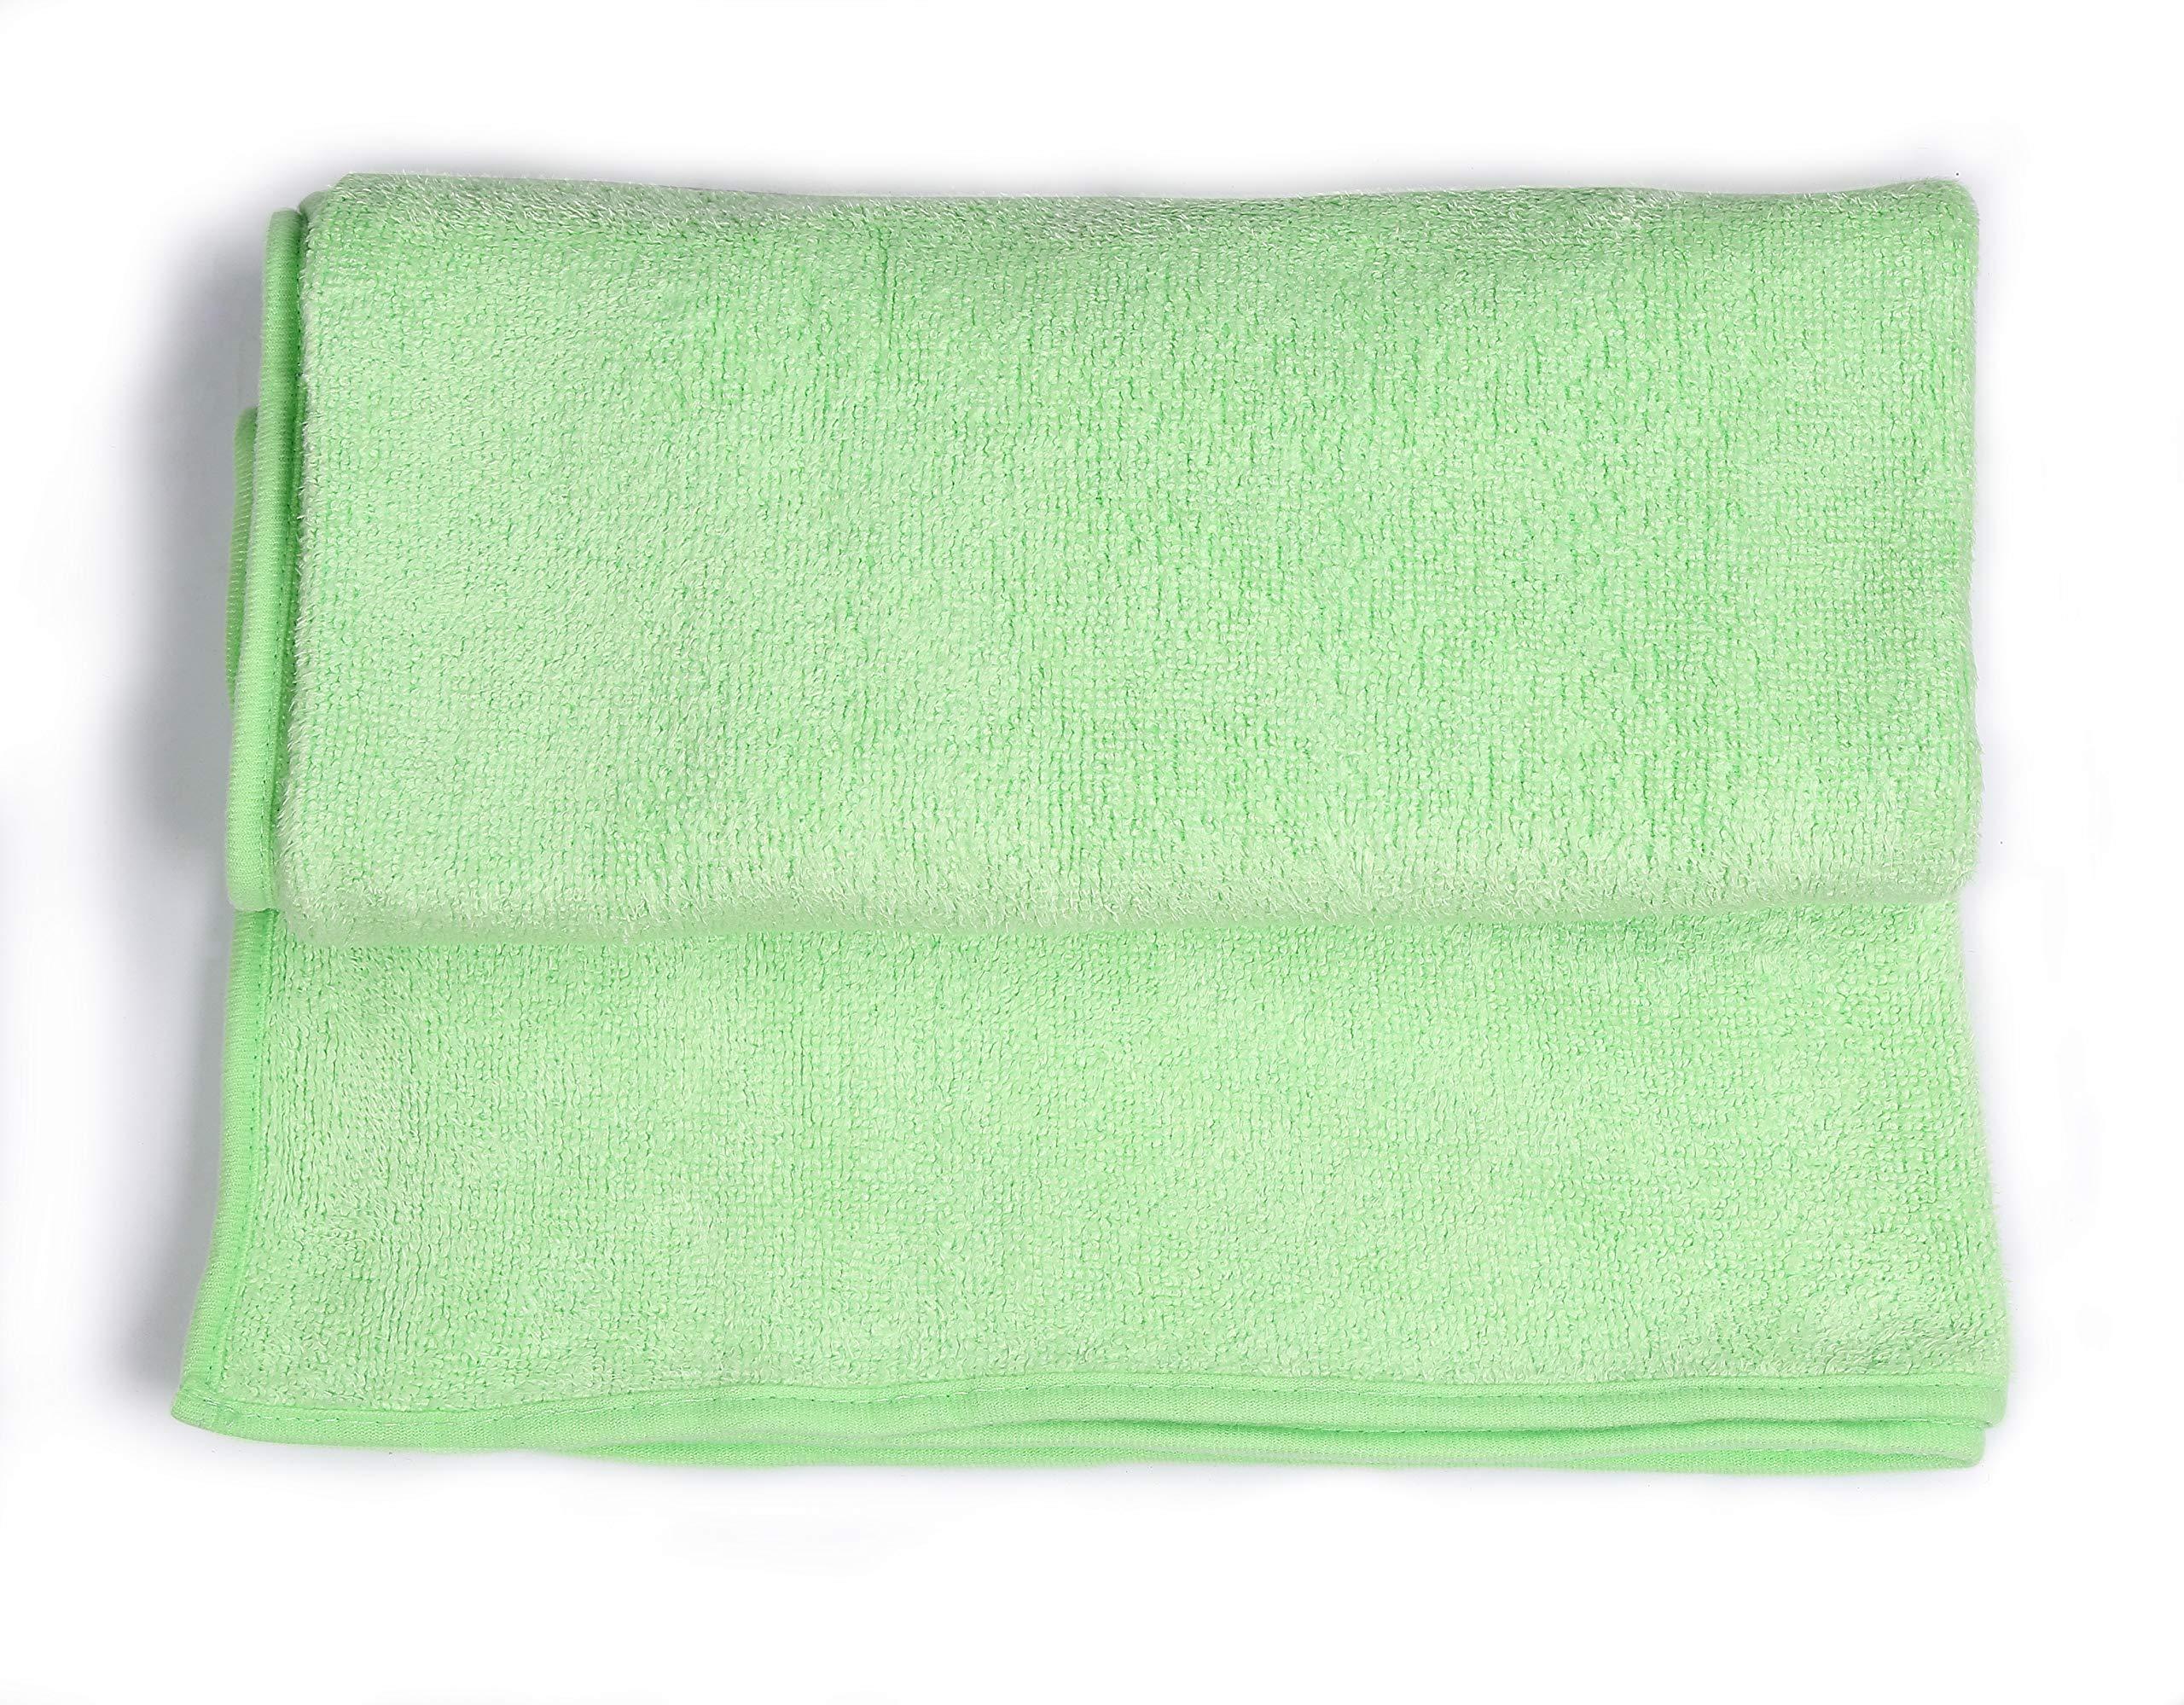 UNIC Bath Towel,Super Absorbent Quick Drying and Antibacterial,100% Microfiber,27''×55'', Multipurpose for Pool Gym Beach Bathroom Hotel Practical Bath Towel(Green)